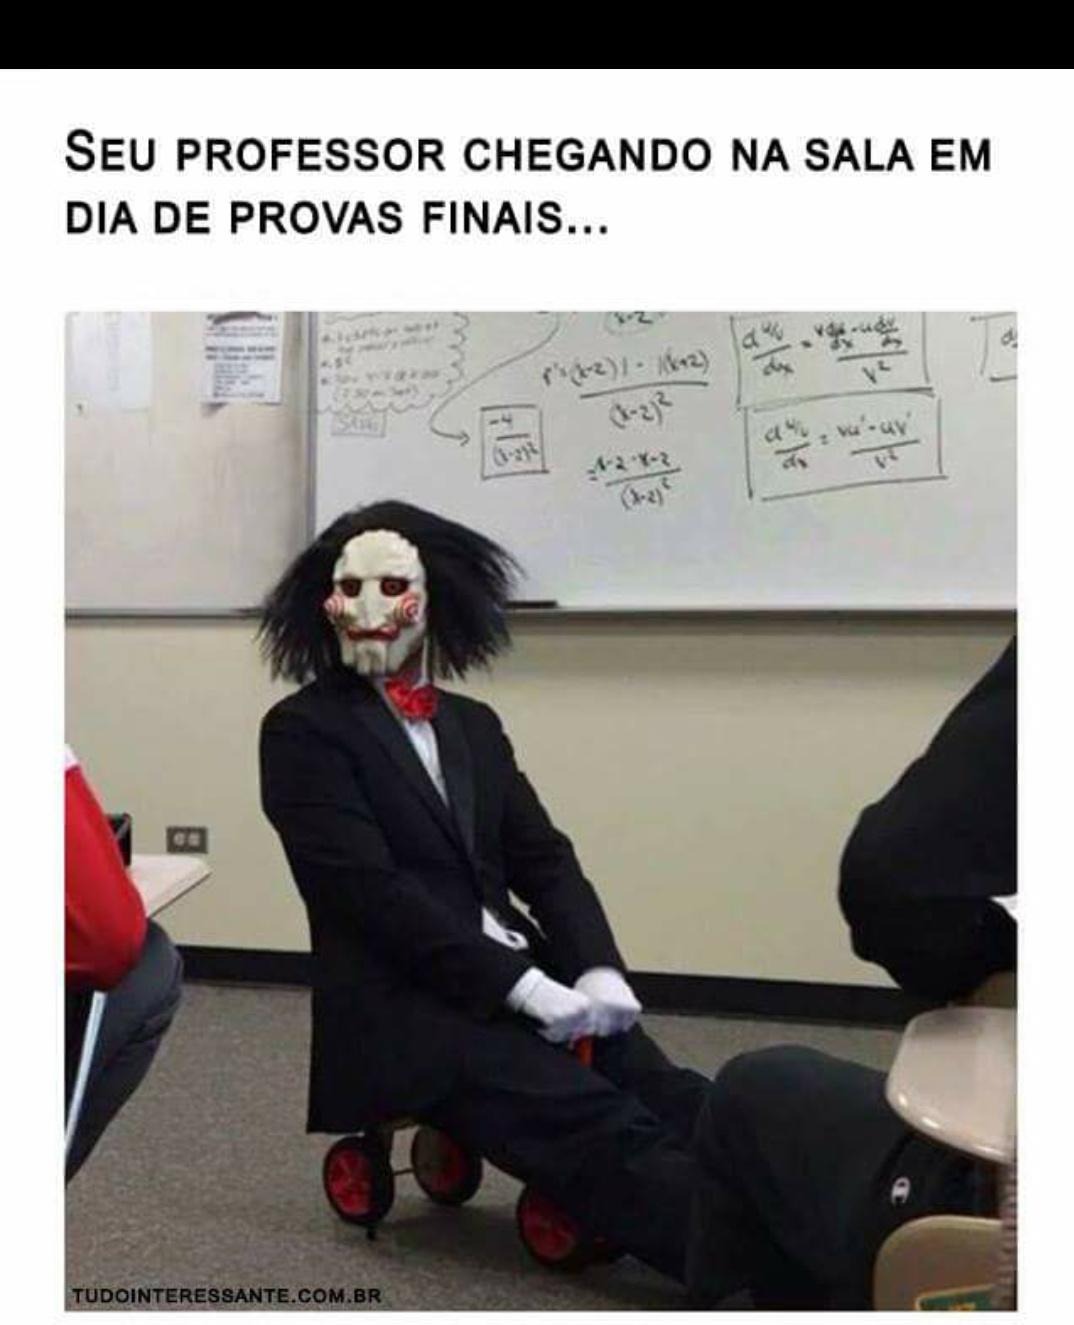 Meu professor de matemática - meme